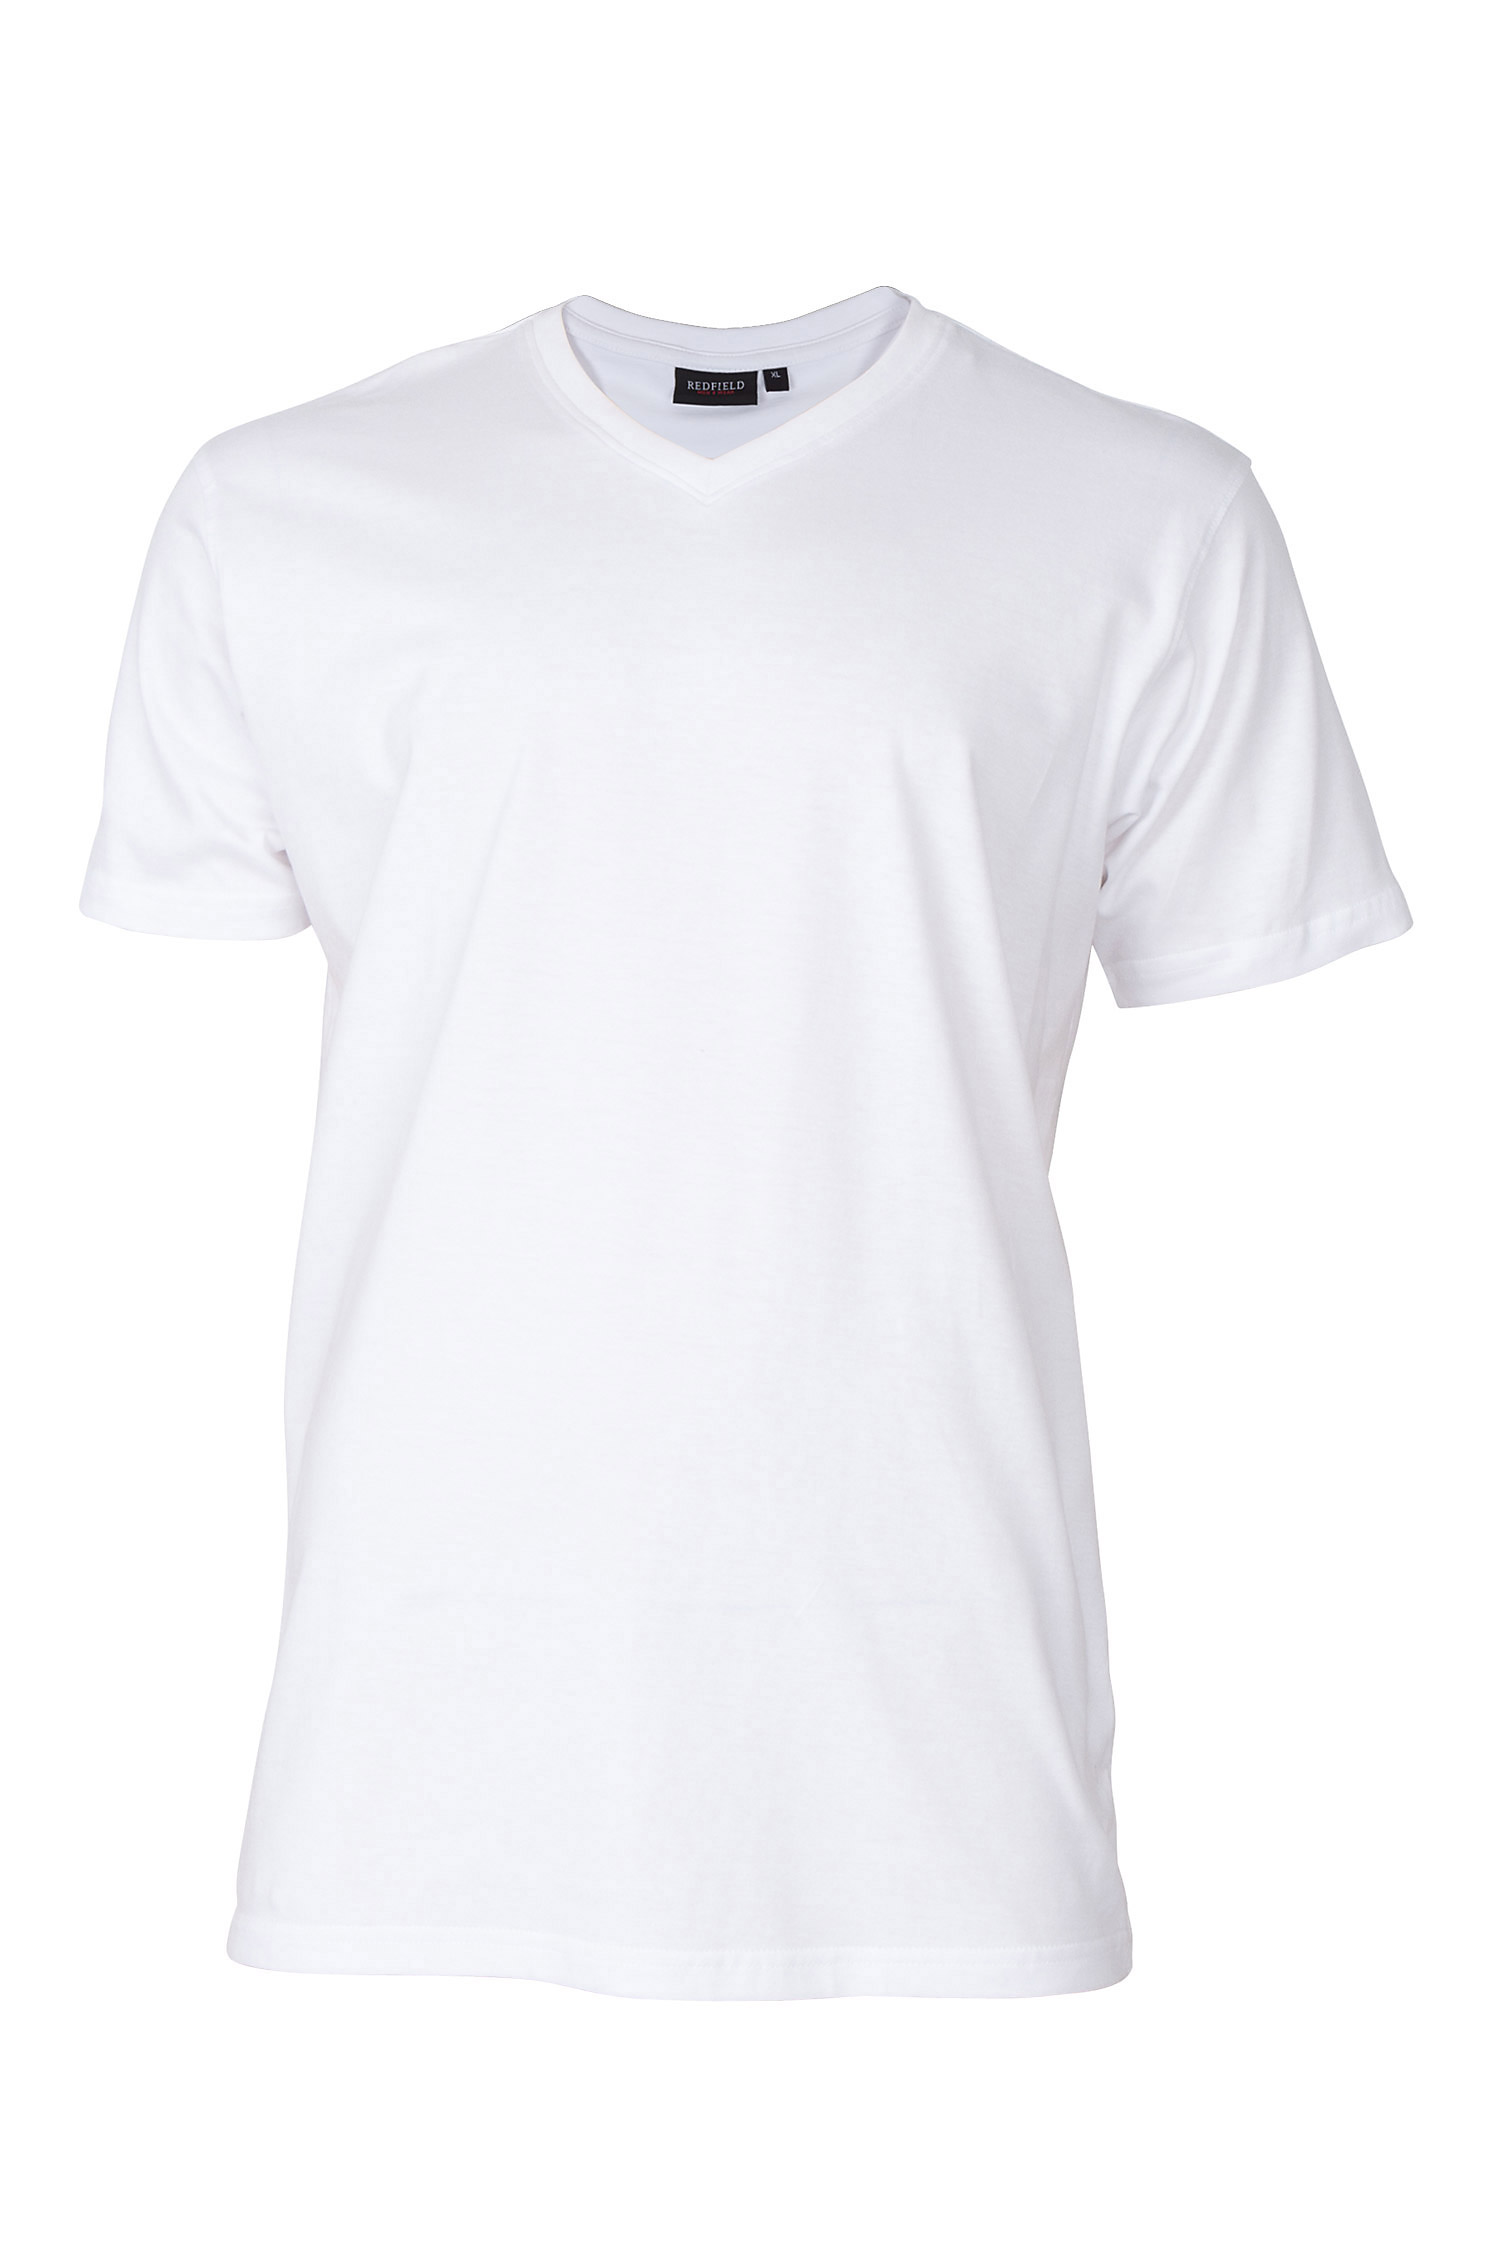 Sport, Camisetas M. Corta, 109110, BLANCO   Zoom